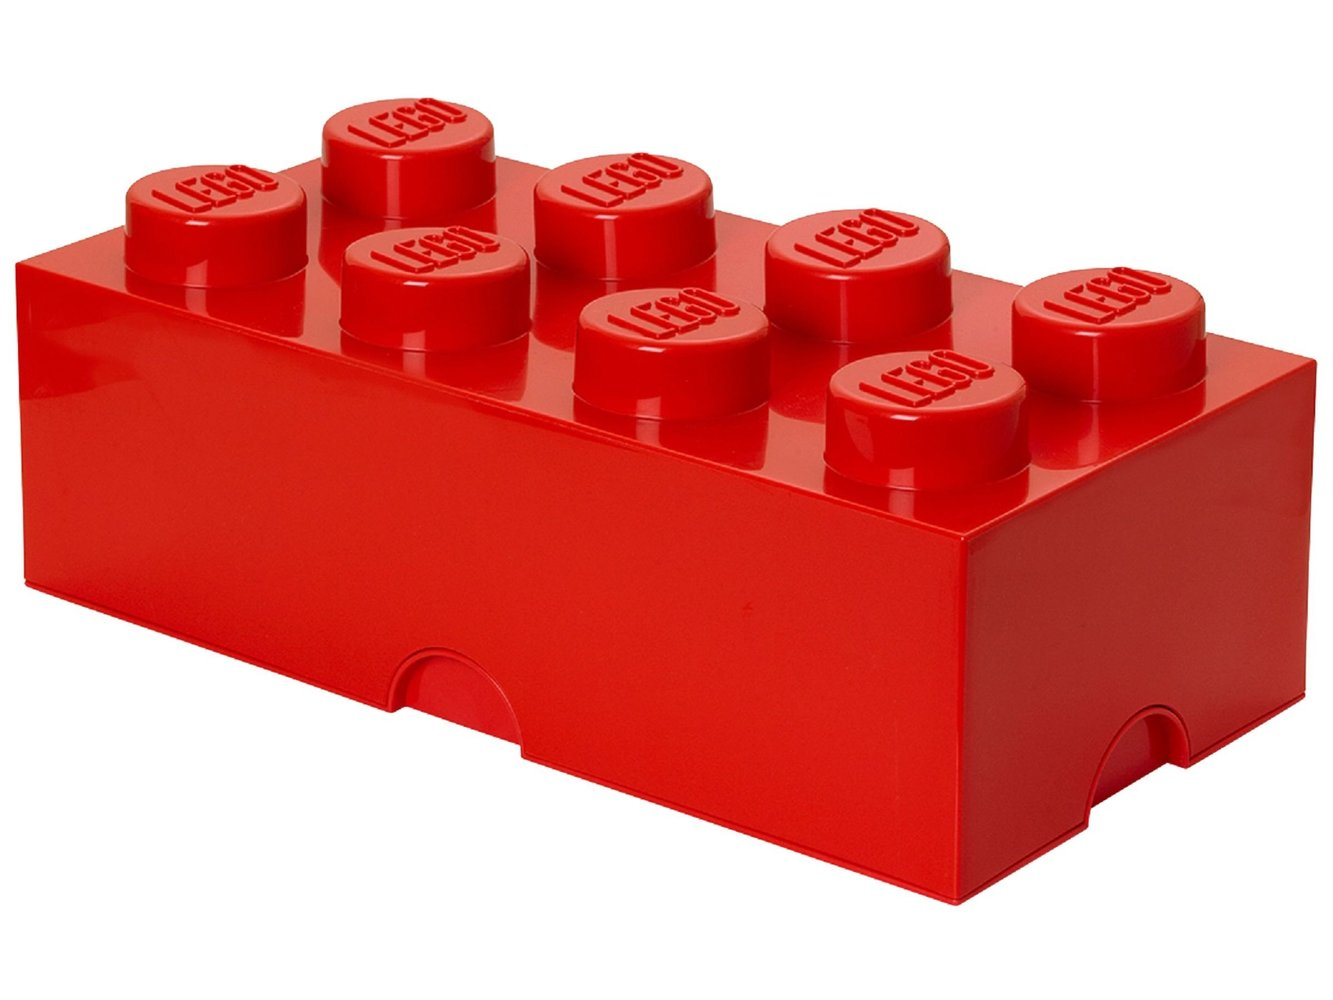 8 stud Red Storage Brick